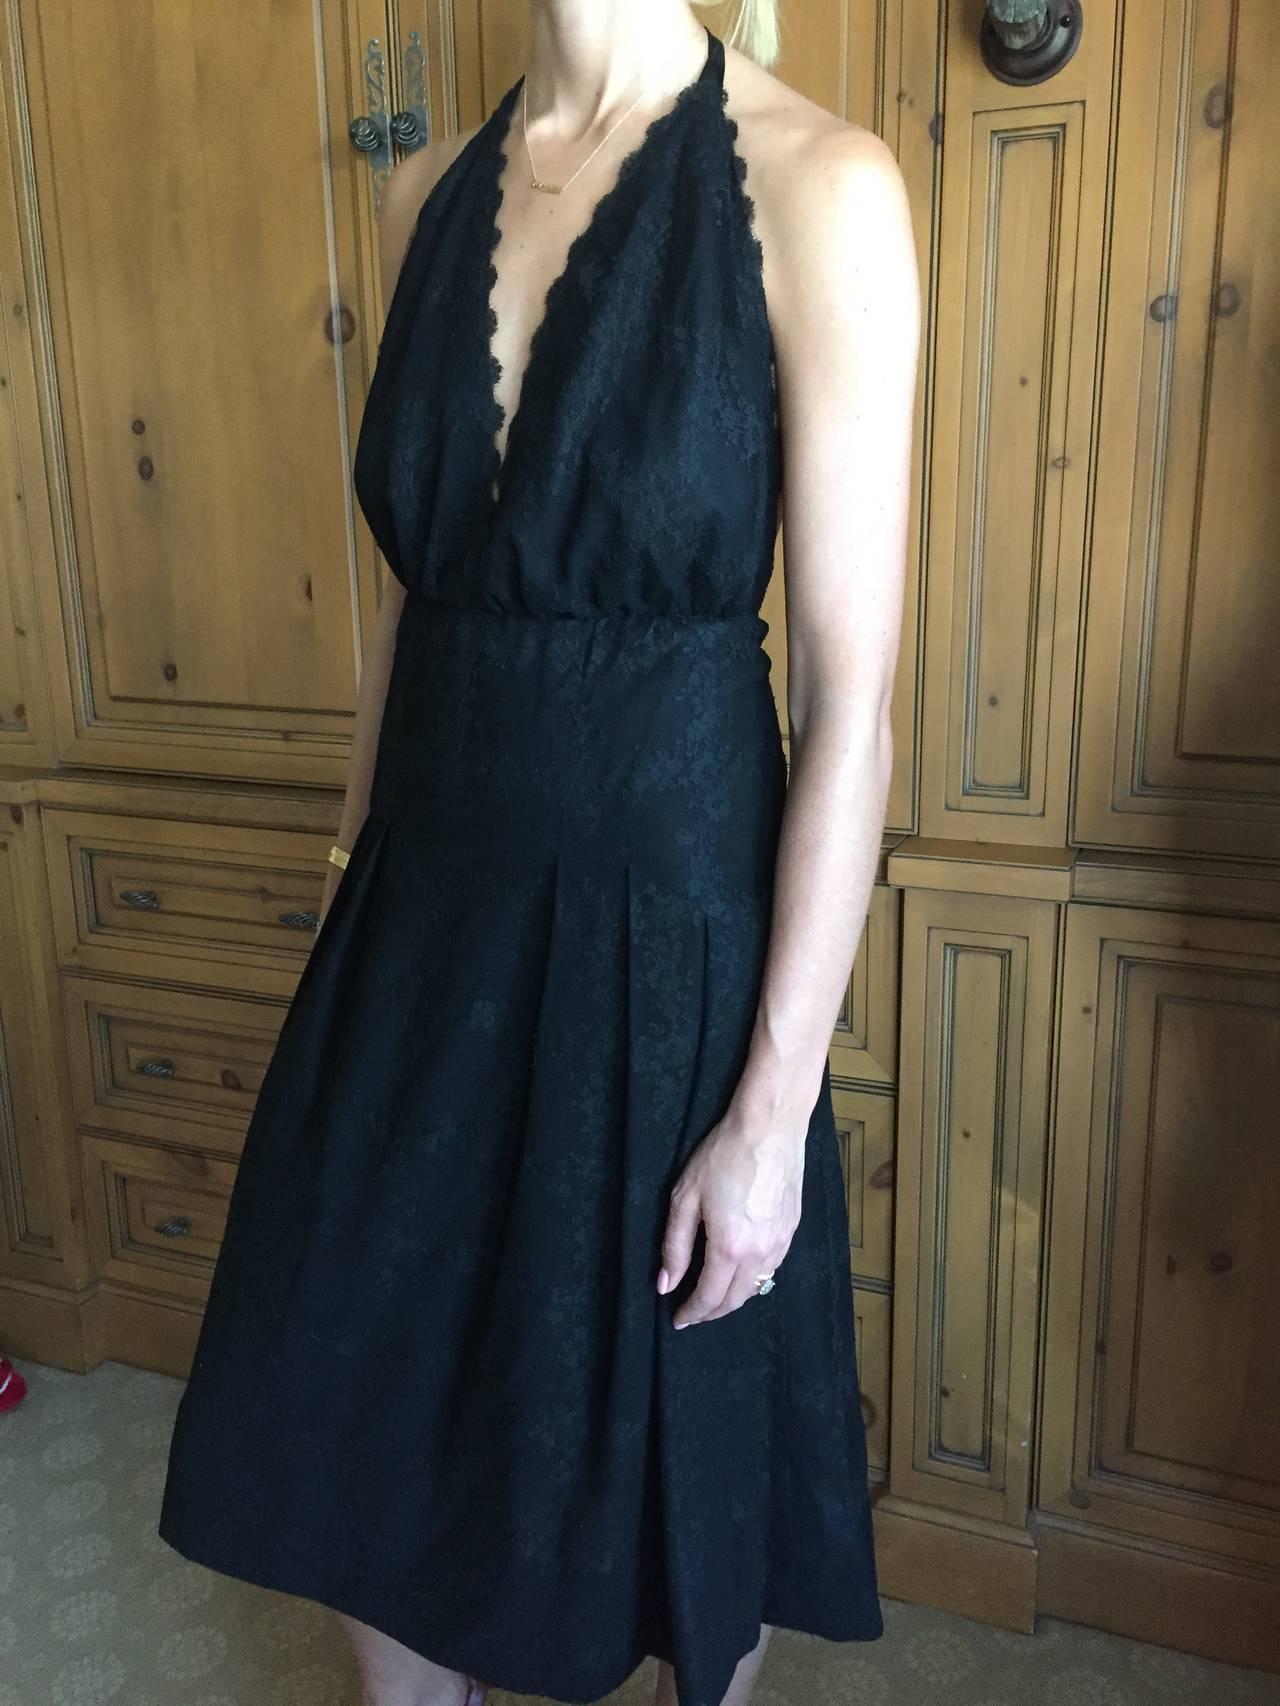 galanos backless halter black lace cocktail dress for sale